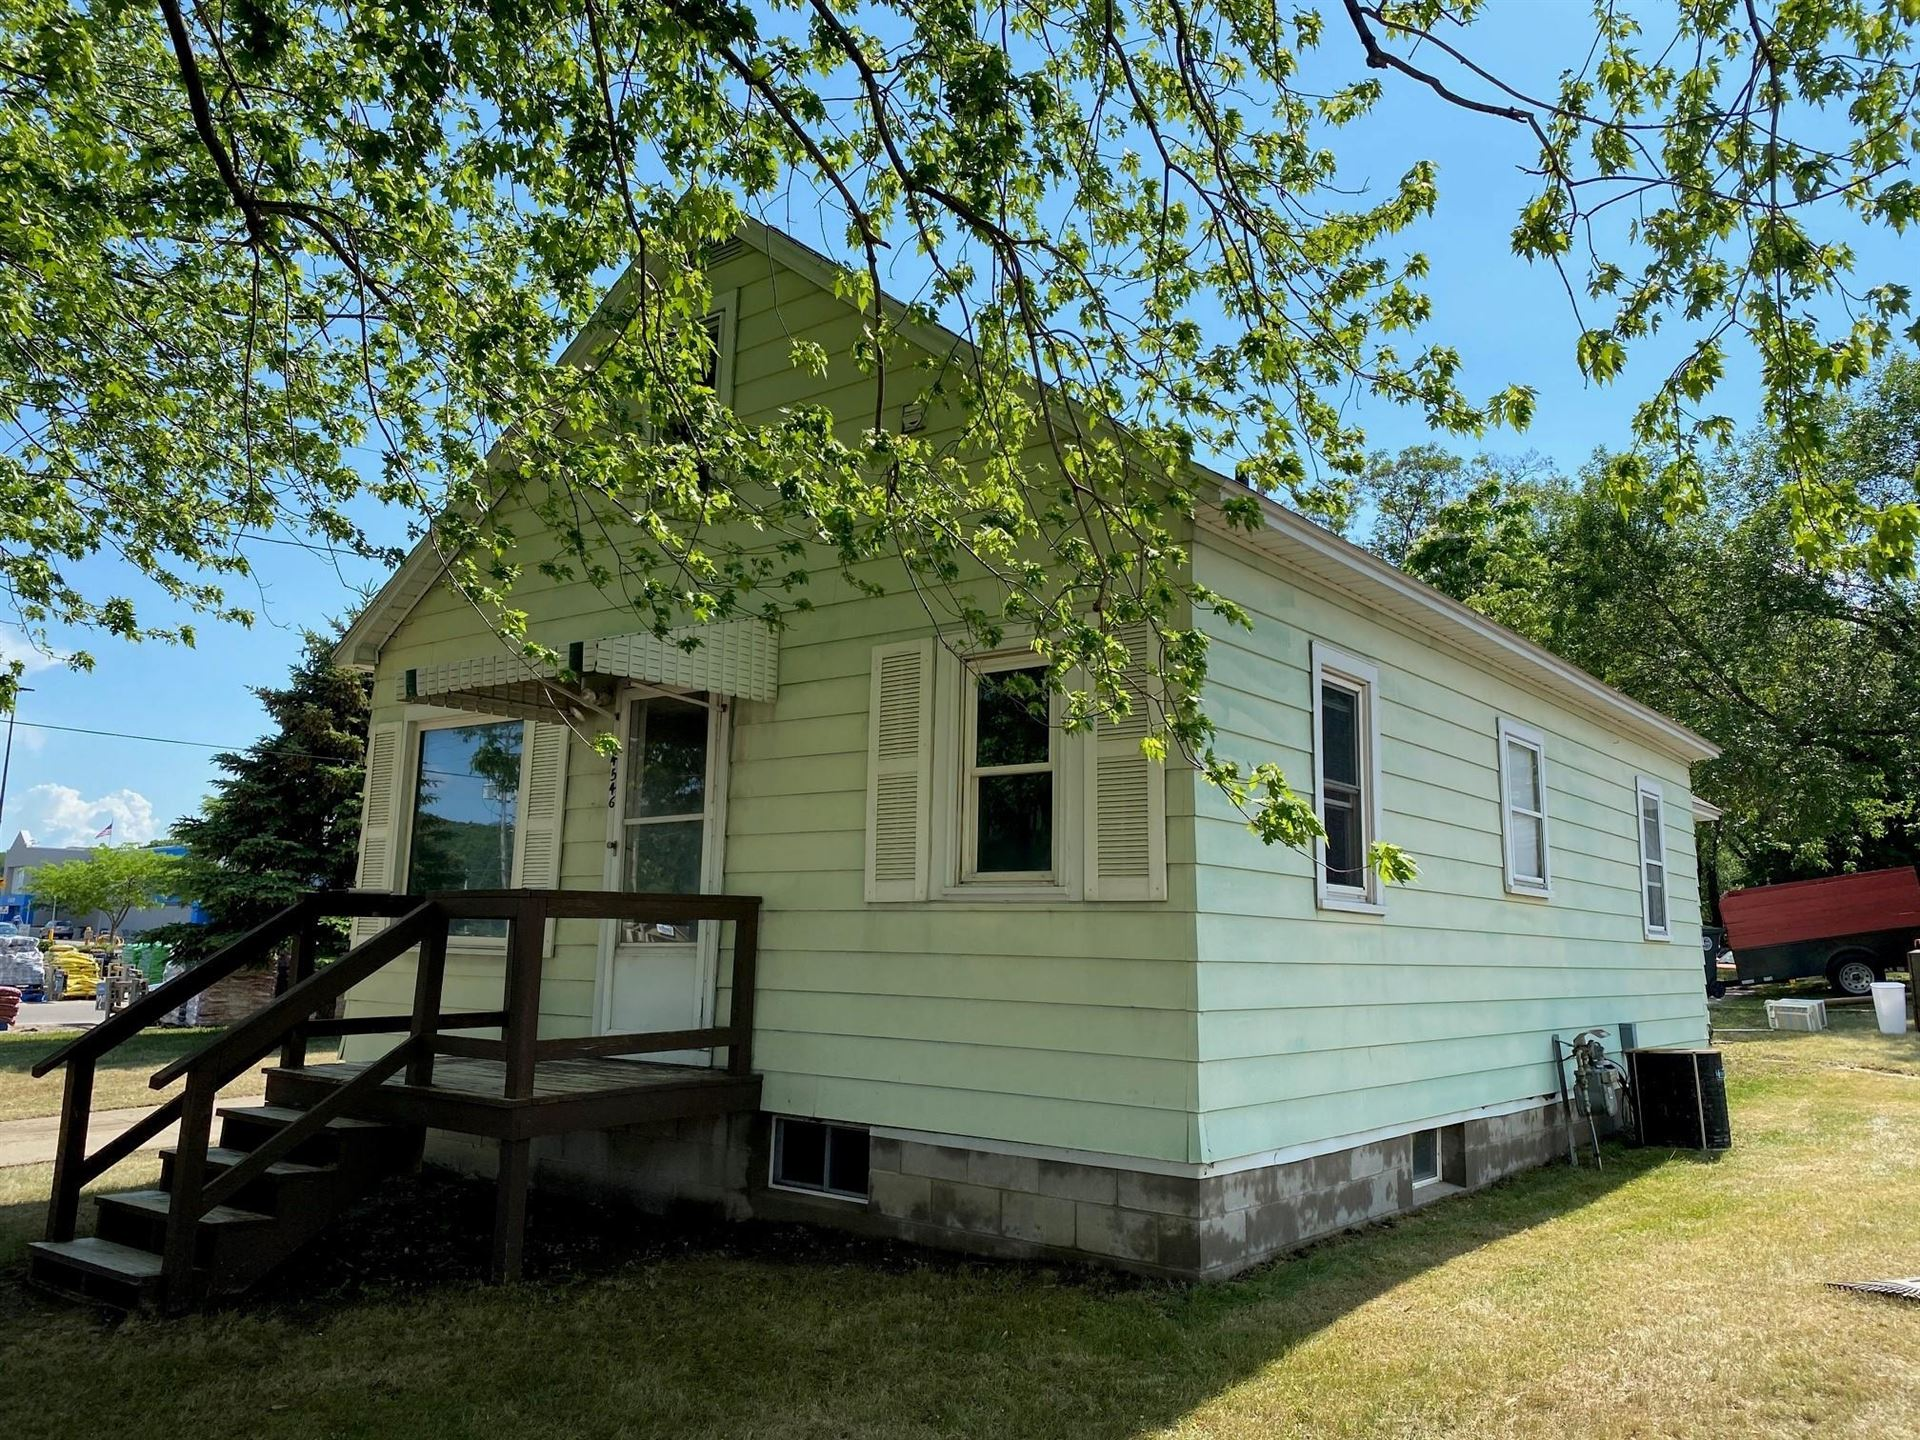 4546 Mormon Coulee Rd, La Crosse, WI 54601 - MLS#: 1747095